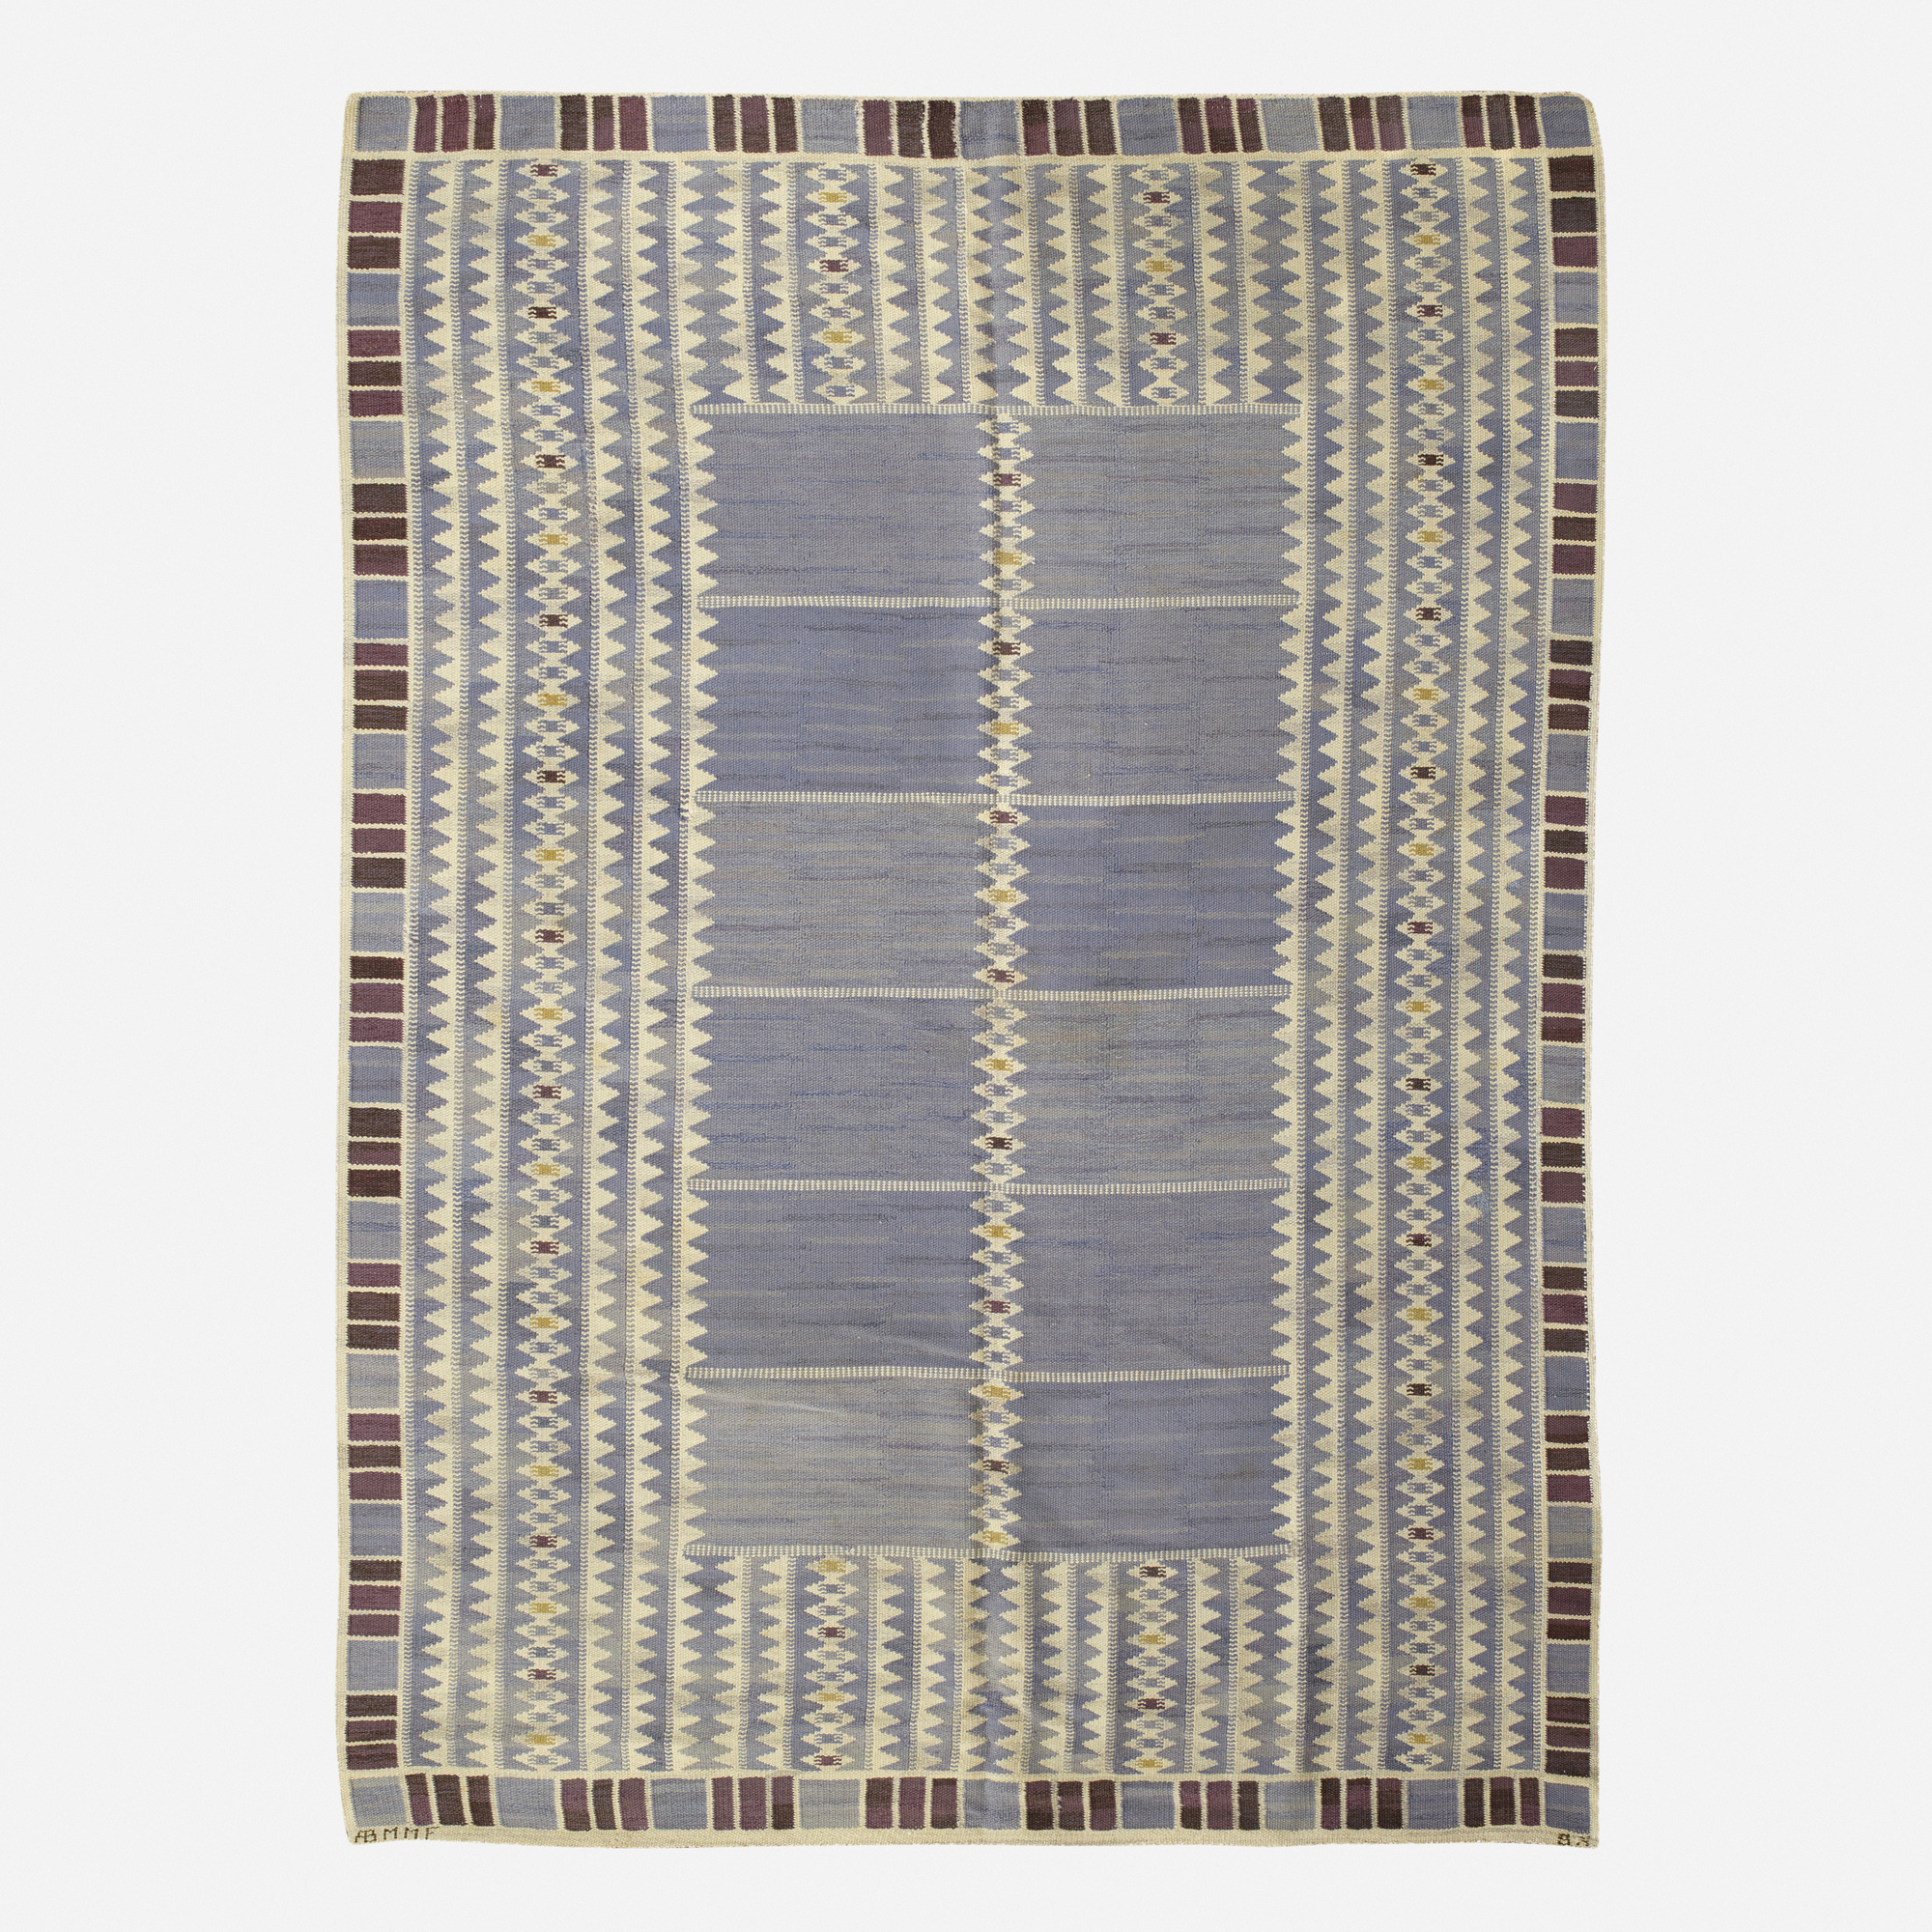 164: Barbro Nilsson / Salerno flatweave carpet (1 of 2)